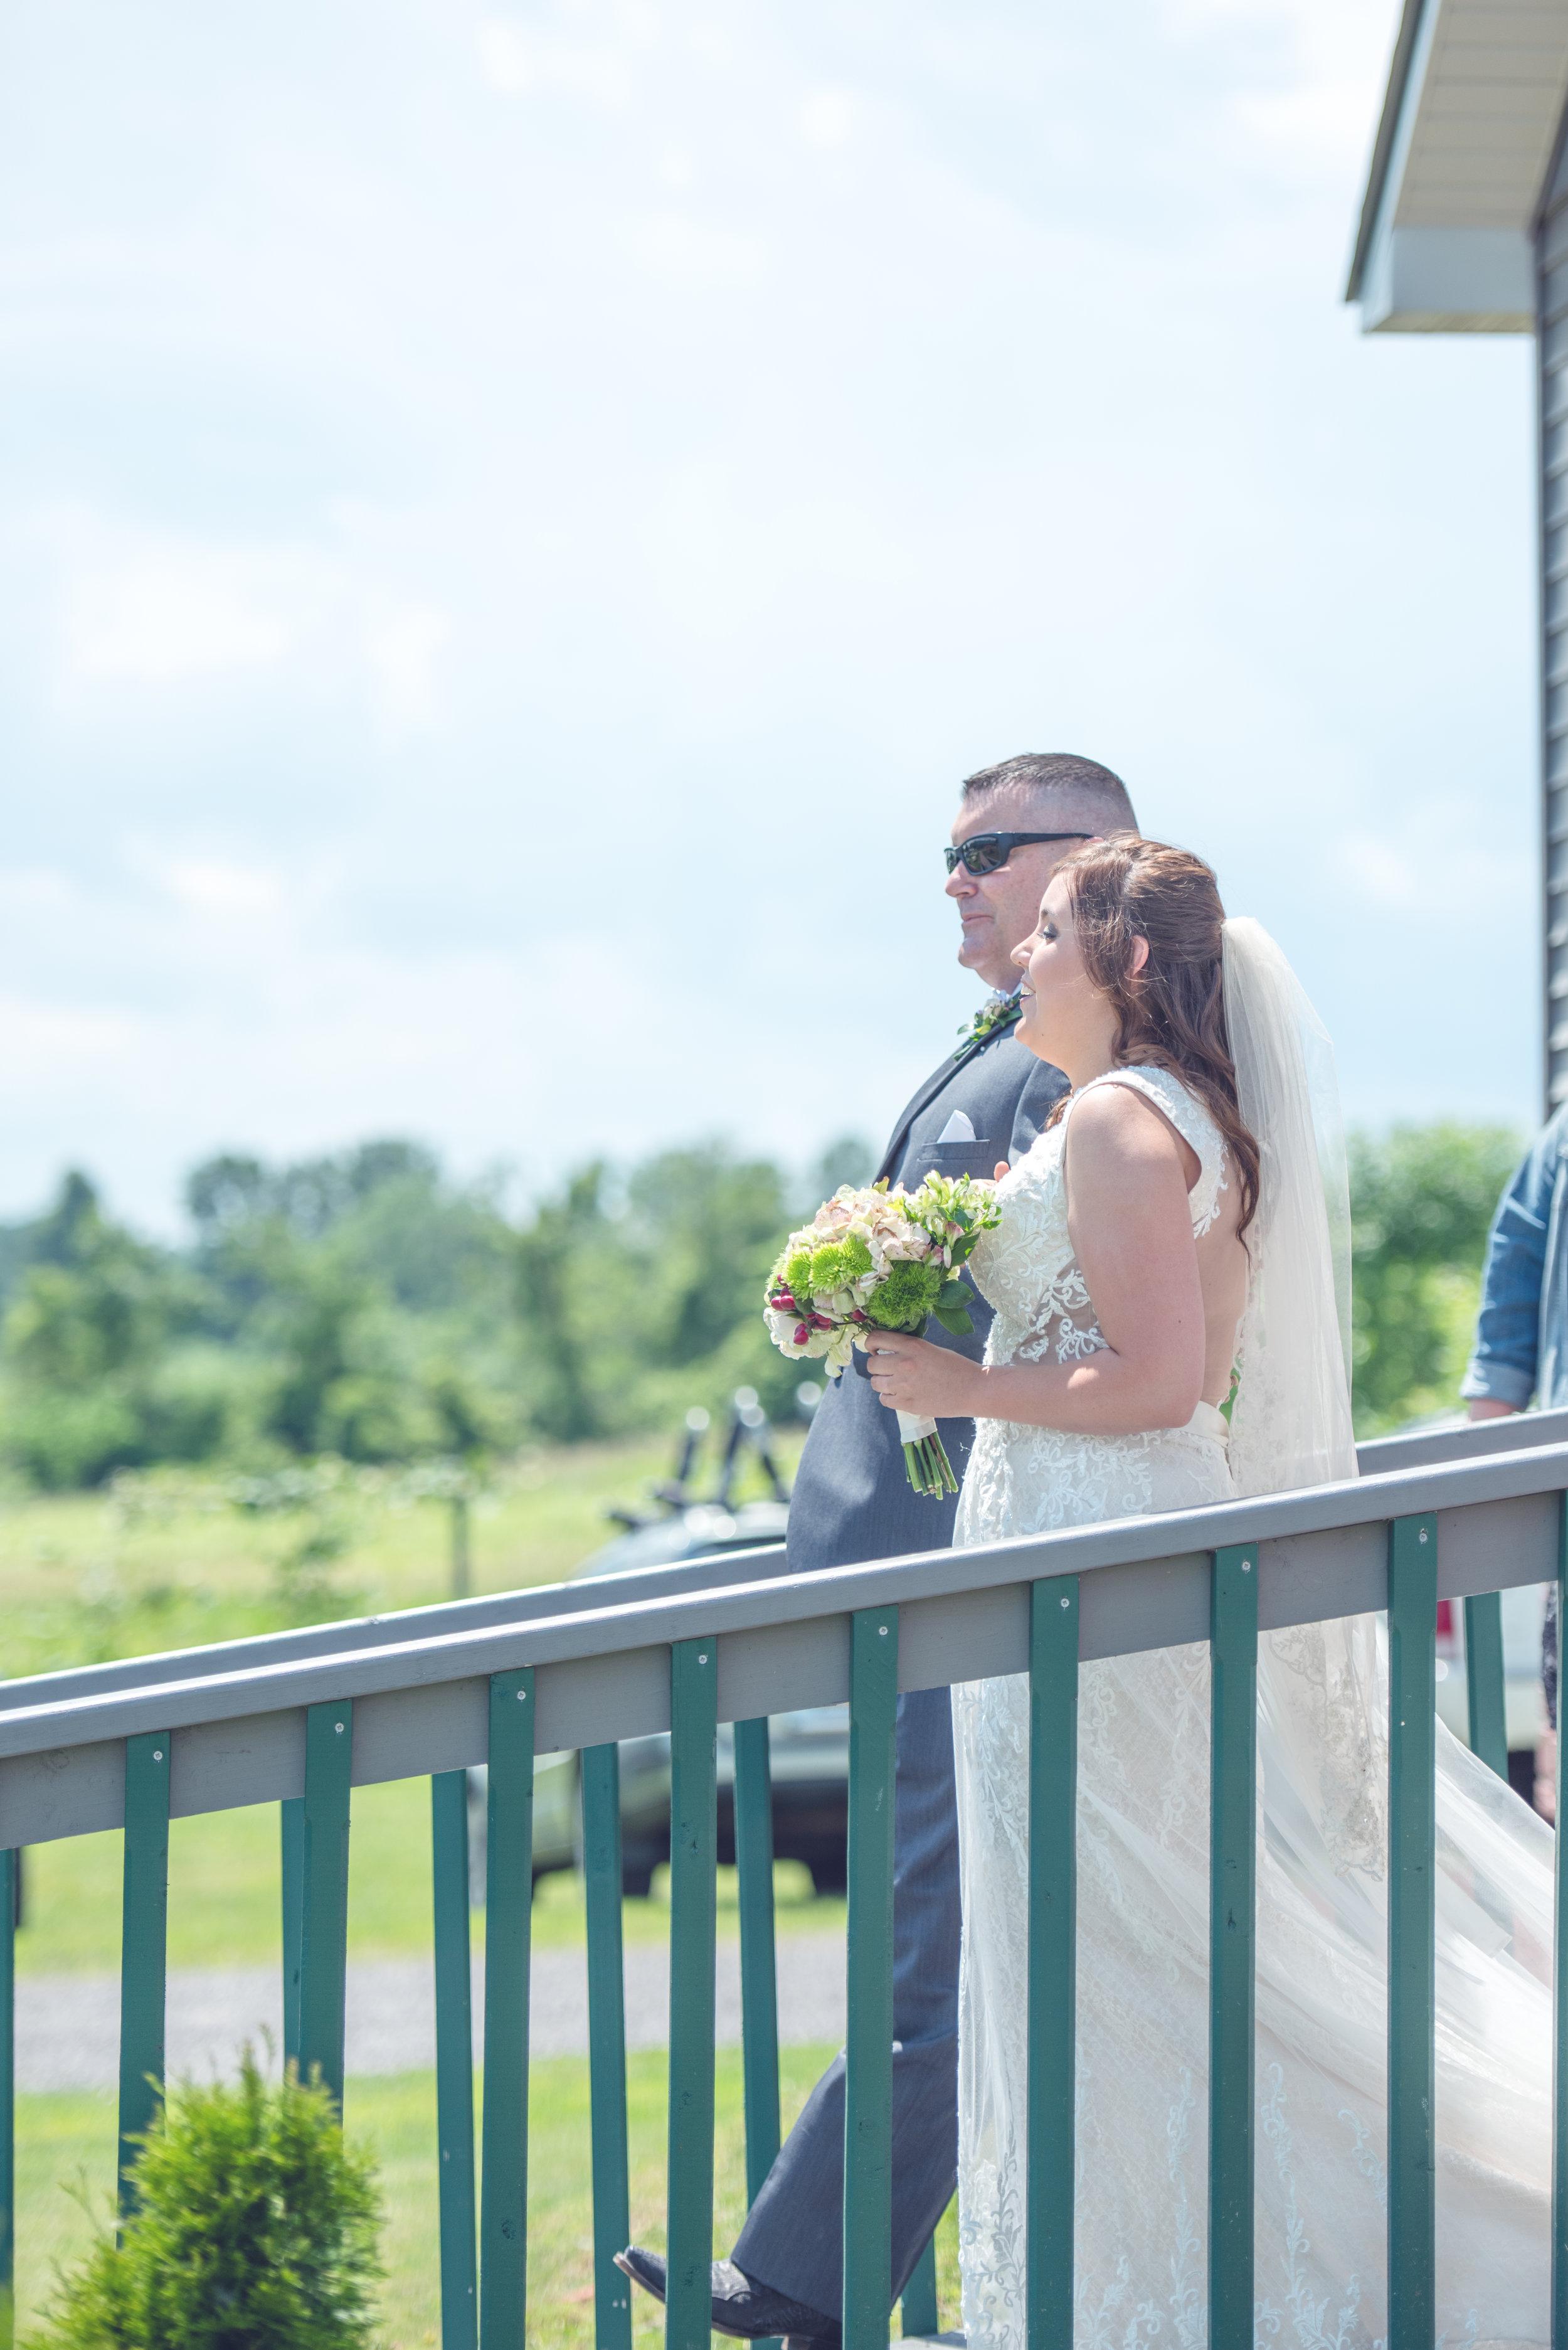 BELL WEDDING 4a  Ceremony-25.jpg